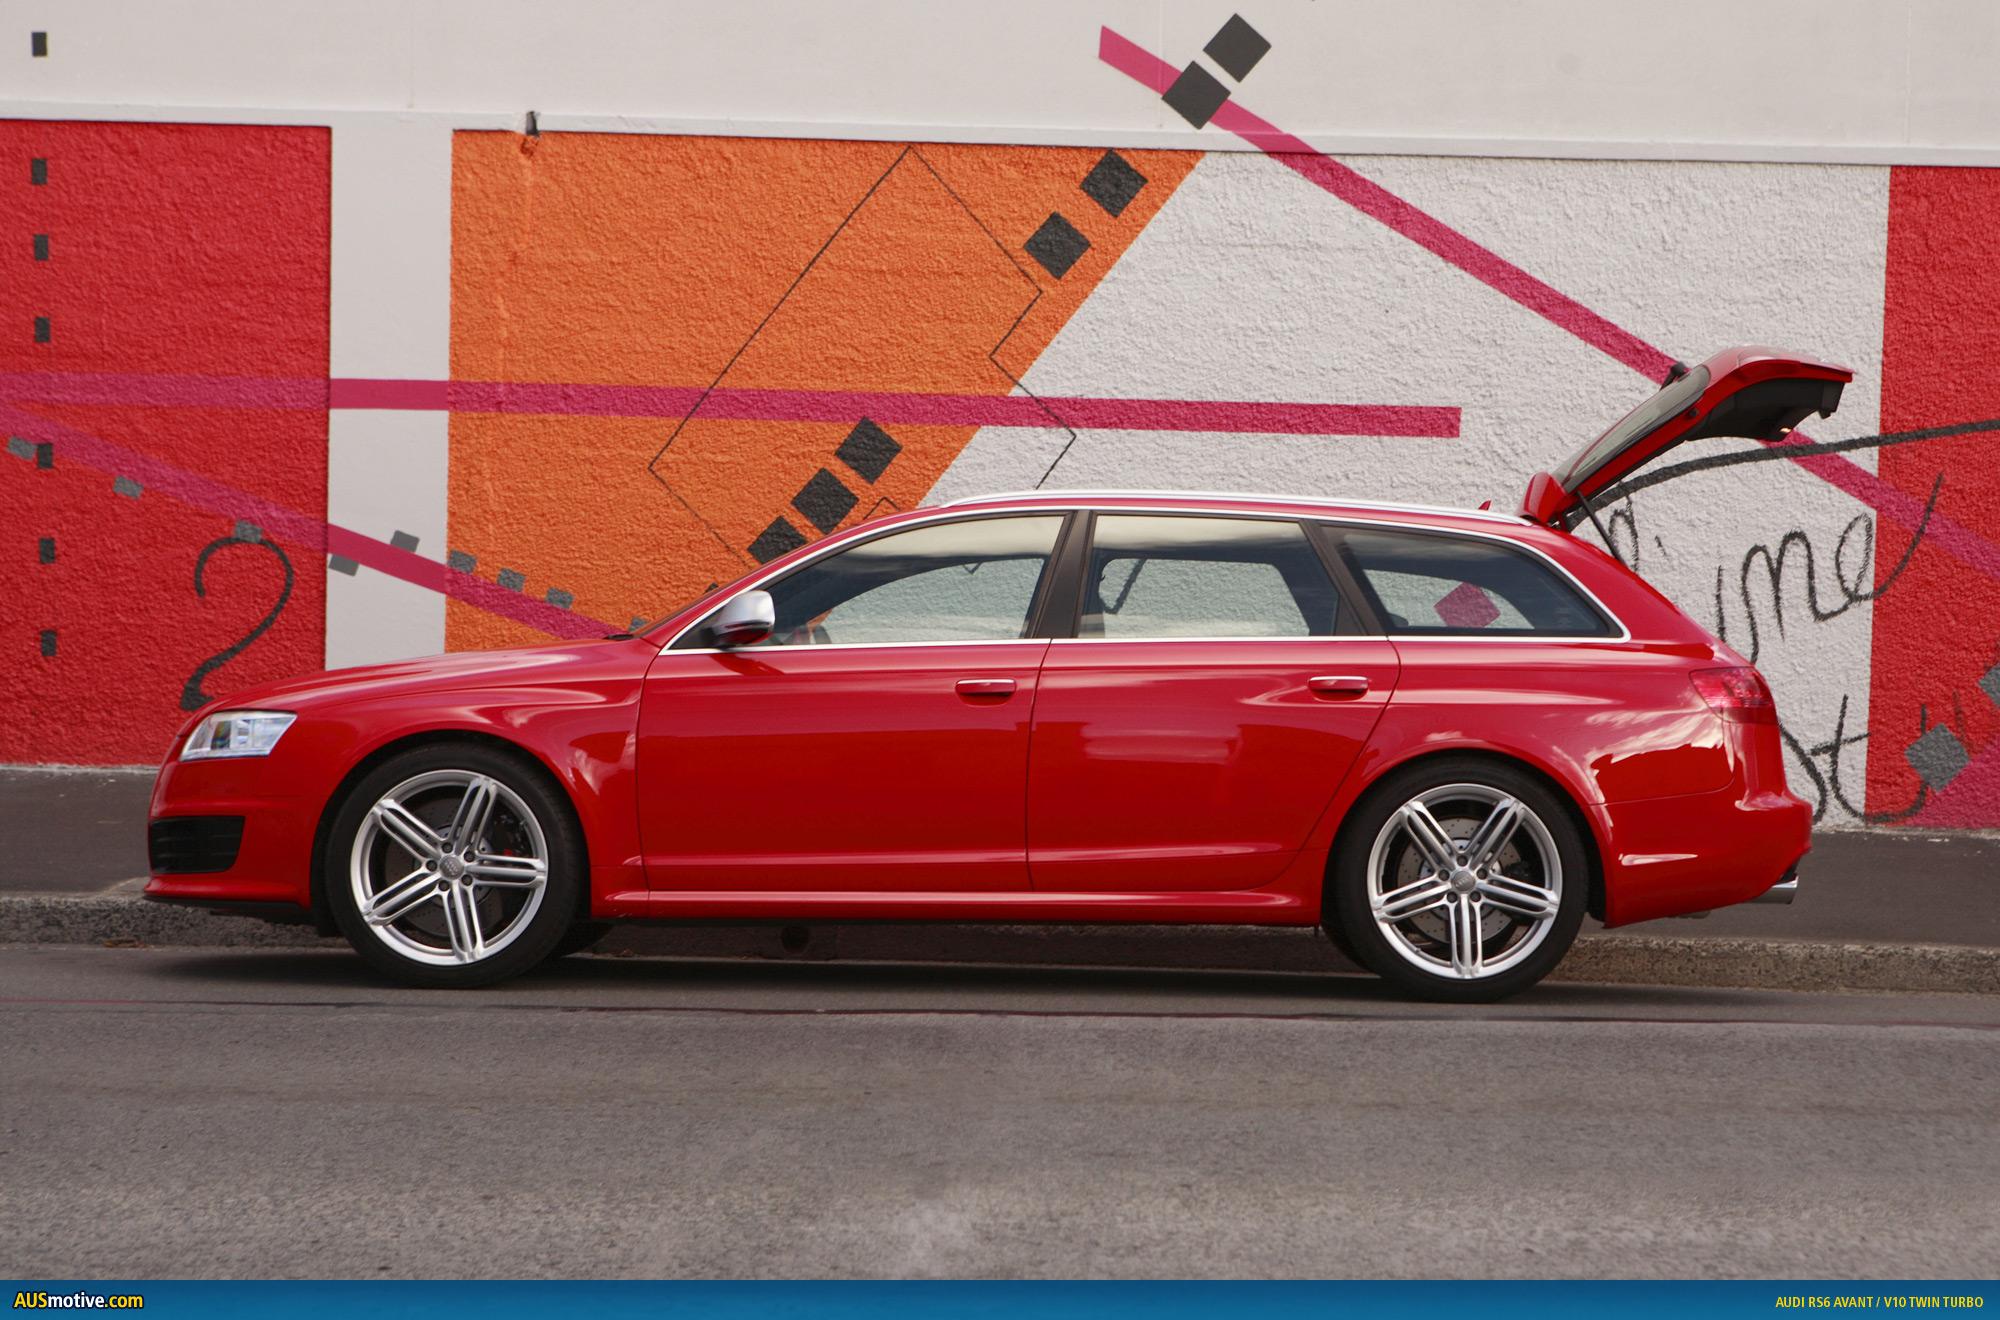 Audi's bahnstorming RS6 Avant